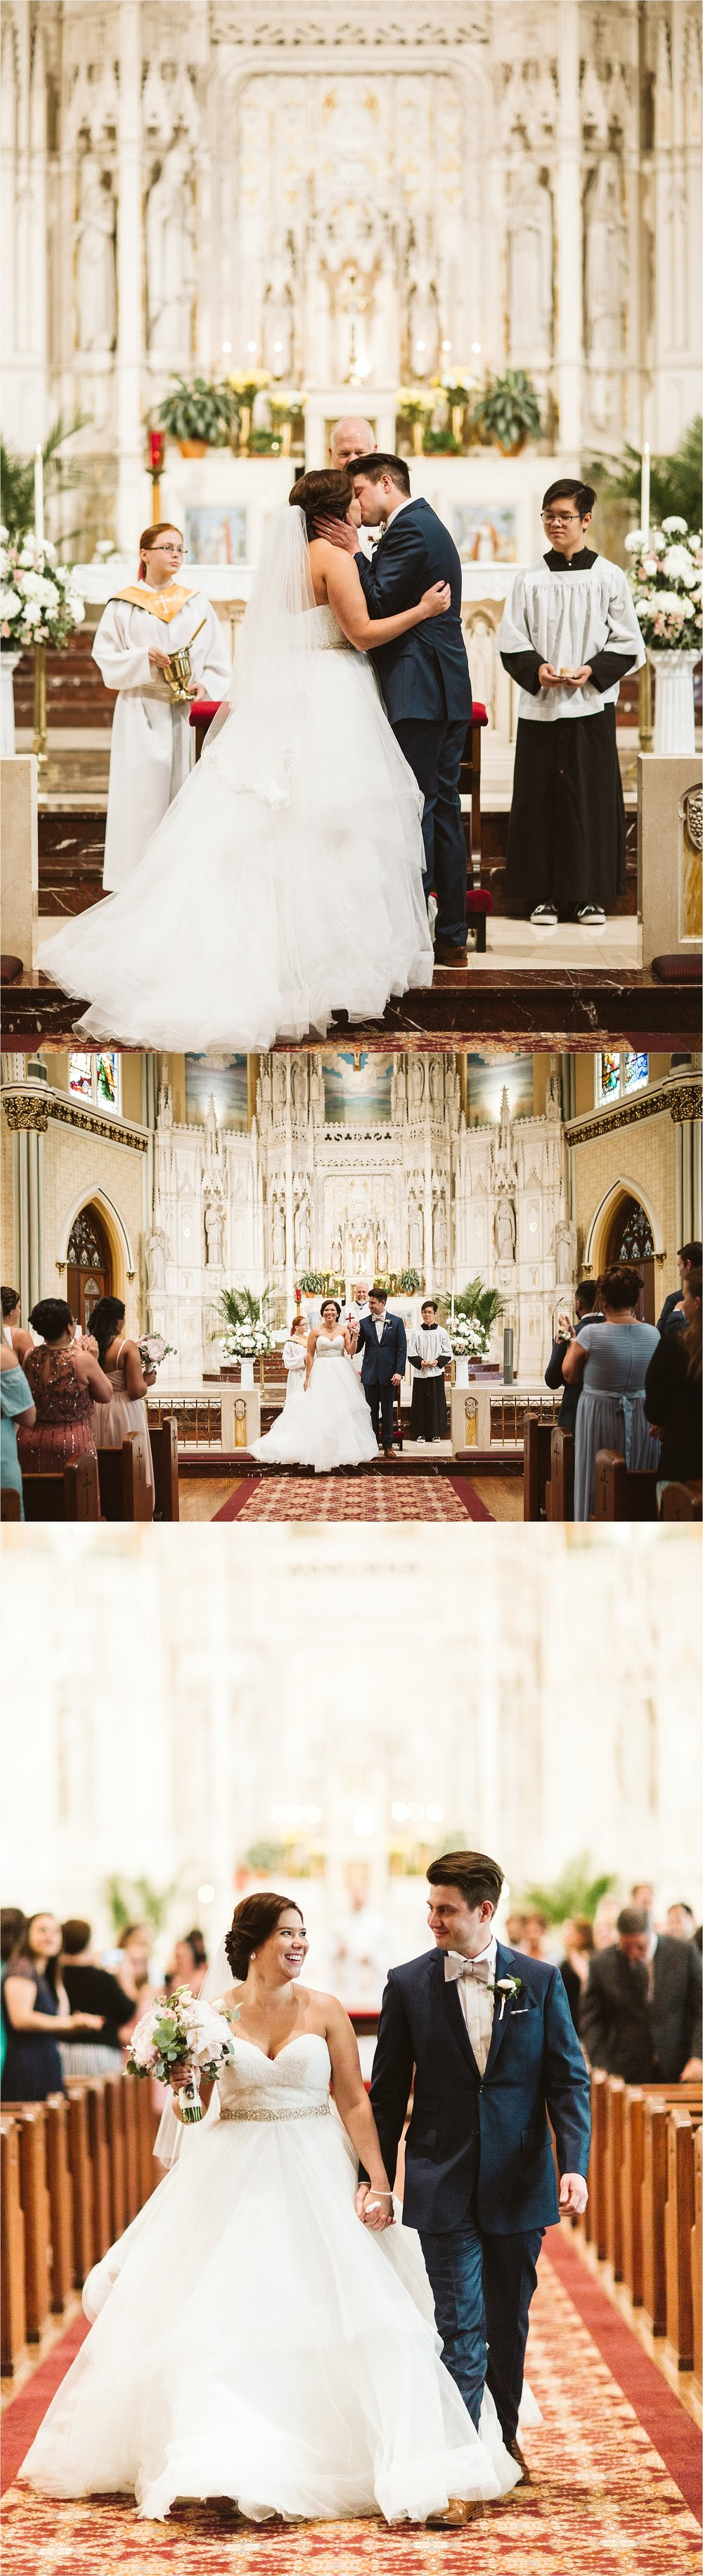 Danada House Wheaton Wedding_0052.jpg